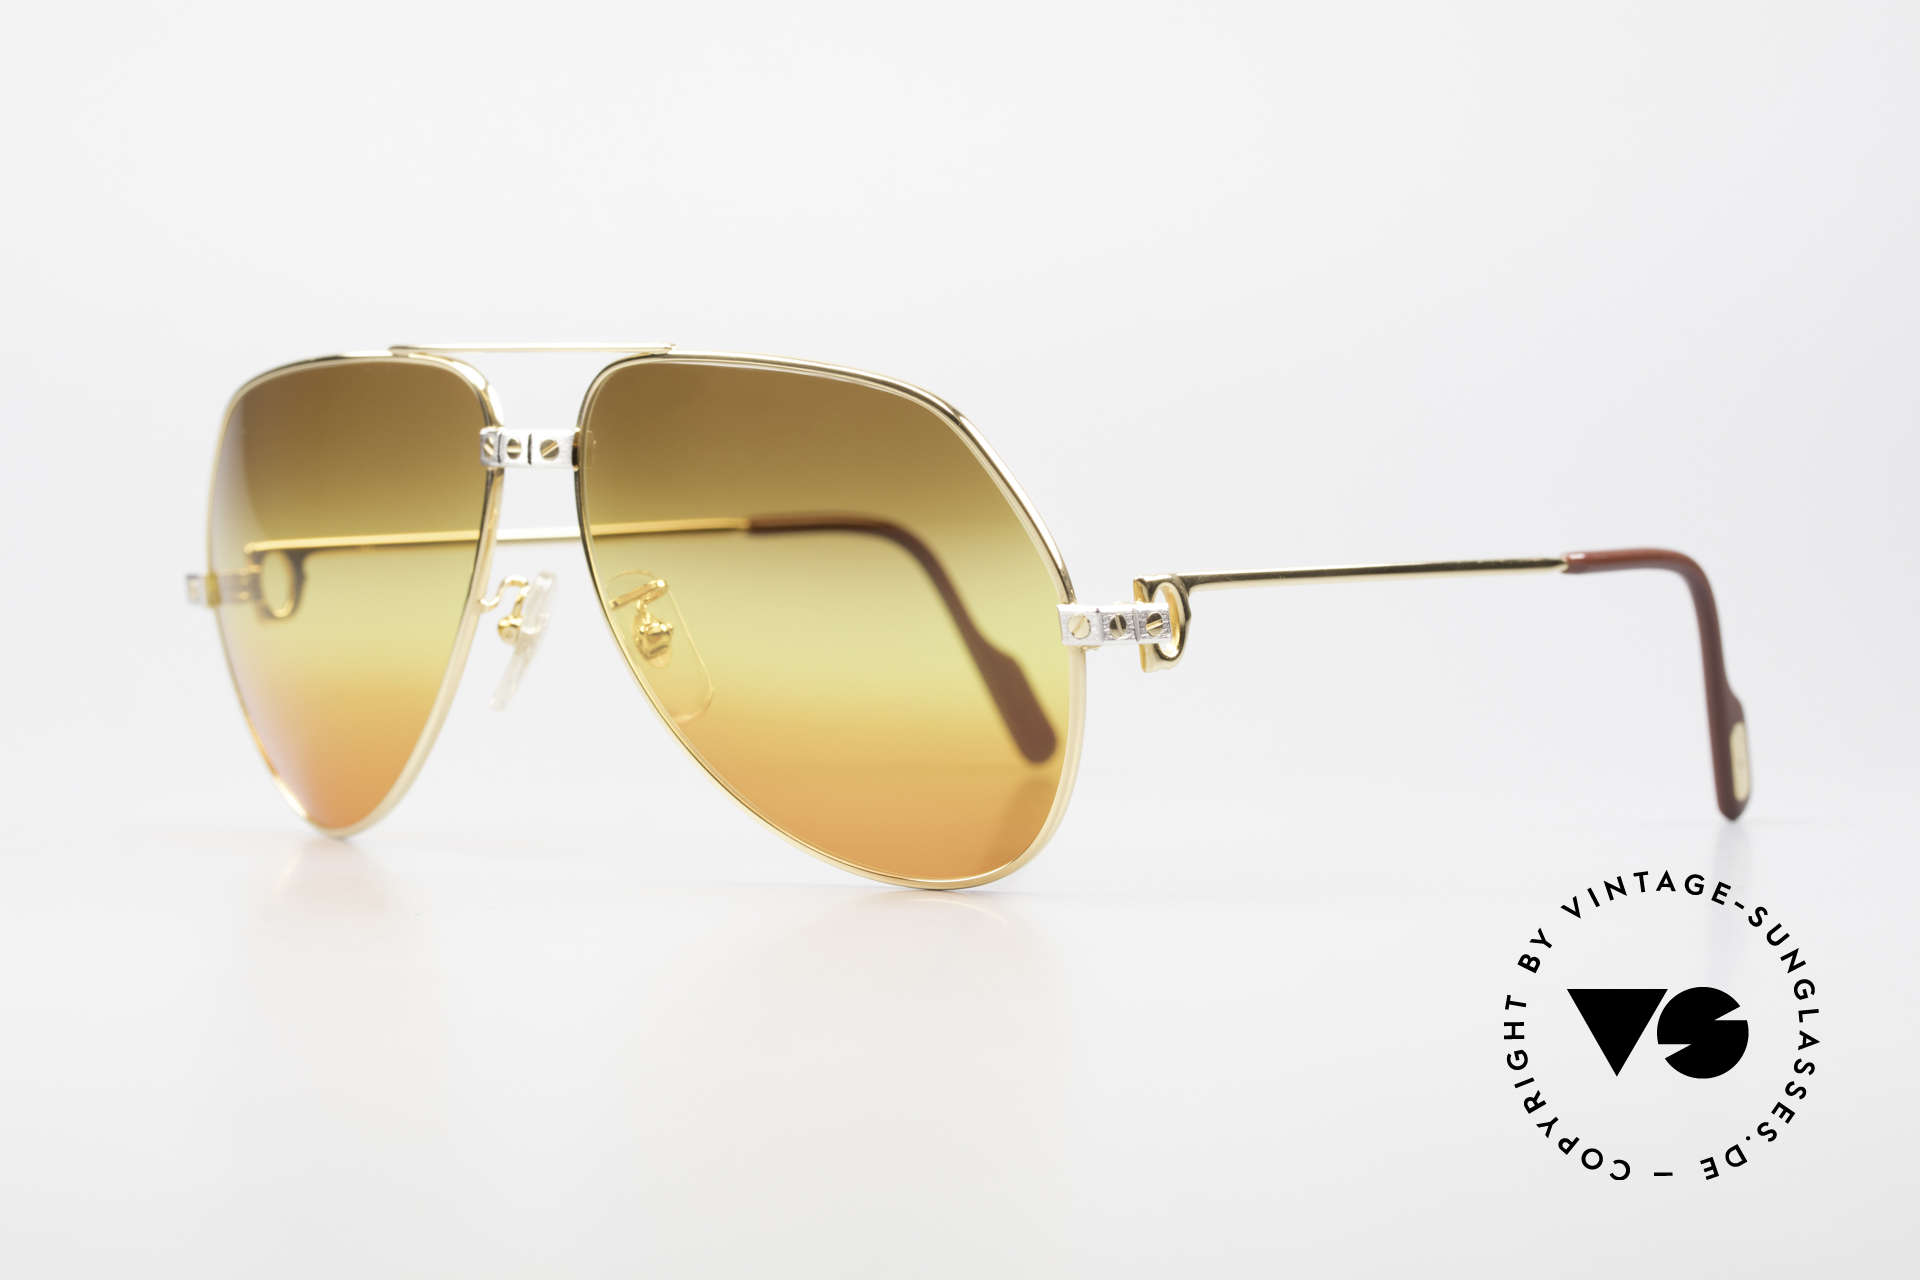 Cartier Vendome Santos - L Triple Gradient Desert Sun, 22ct GOLD-PLATED frame in LARGE SIZE 62-14, 140!, Made for Men